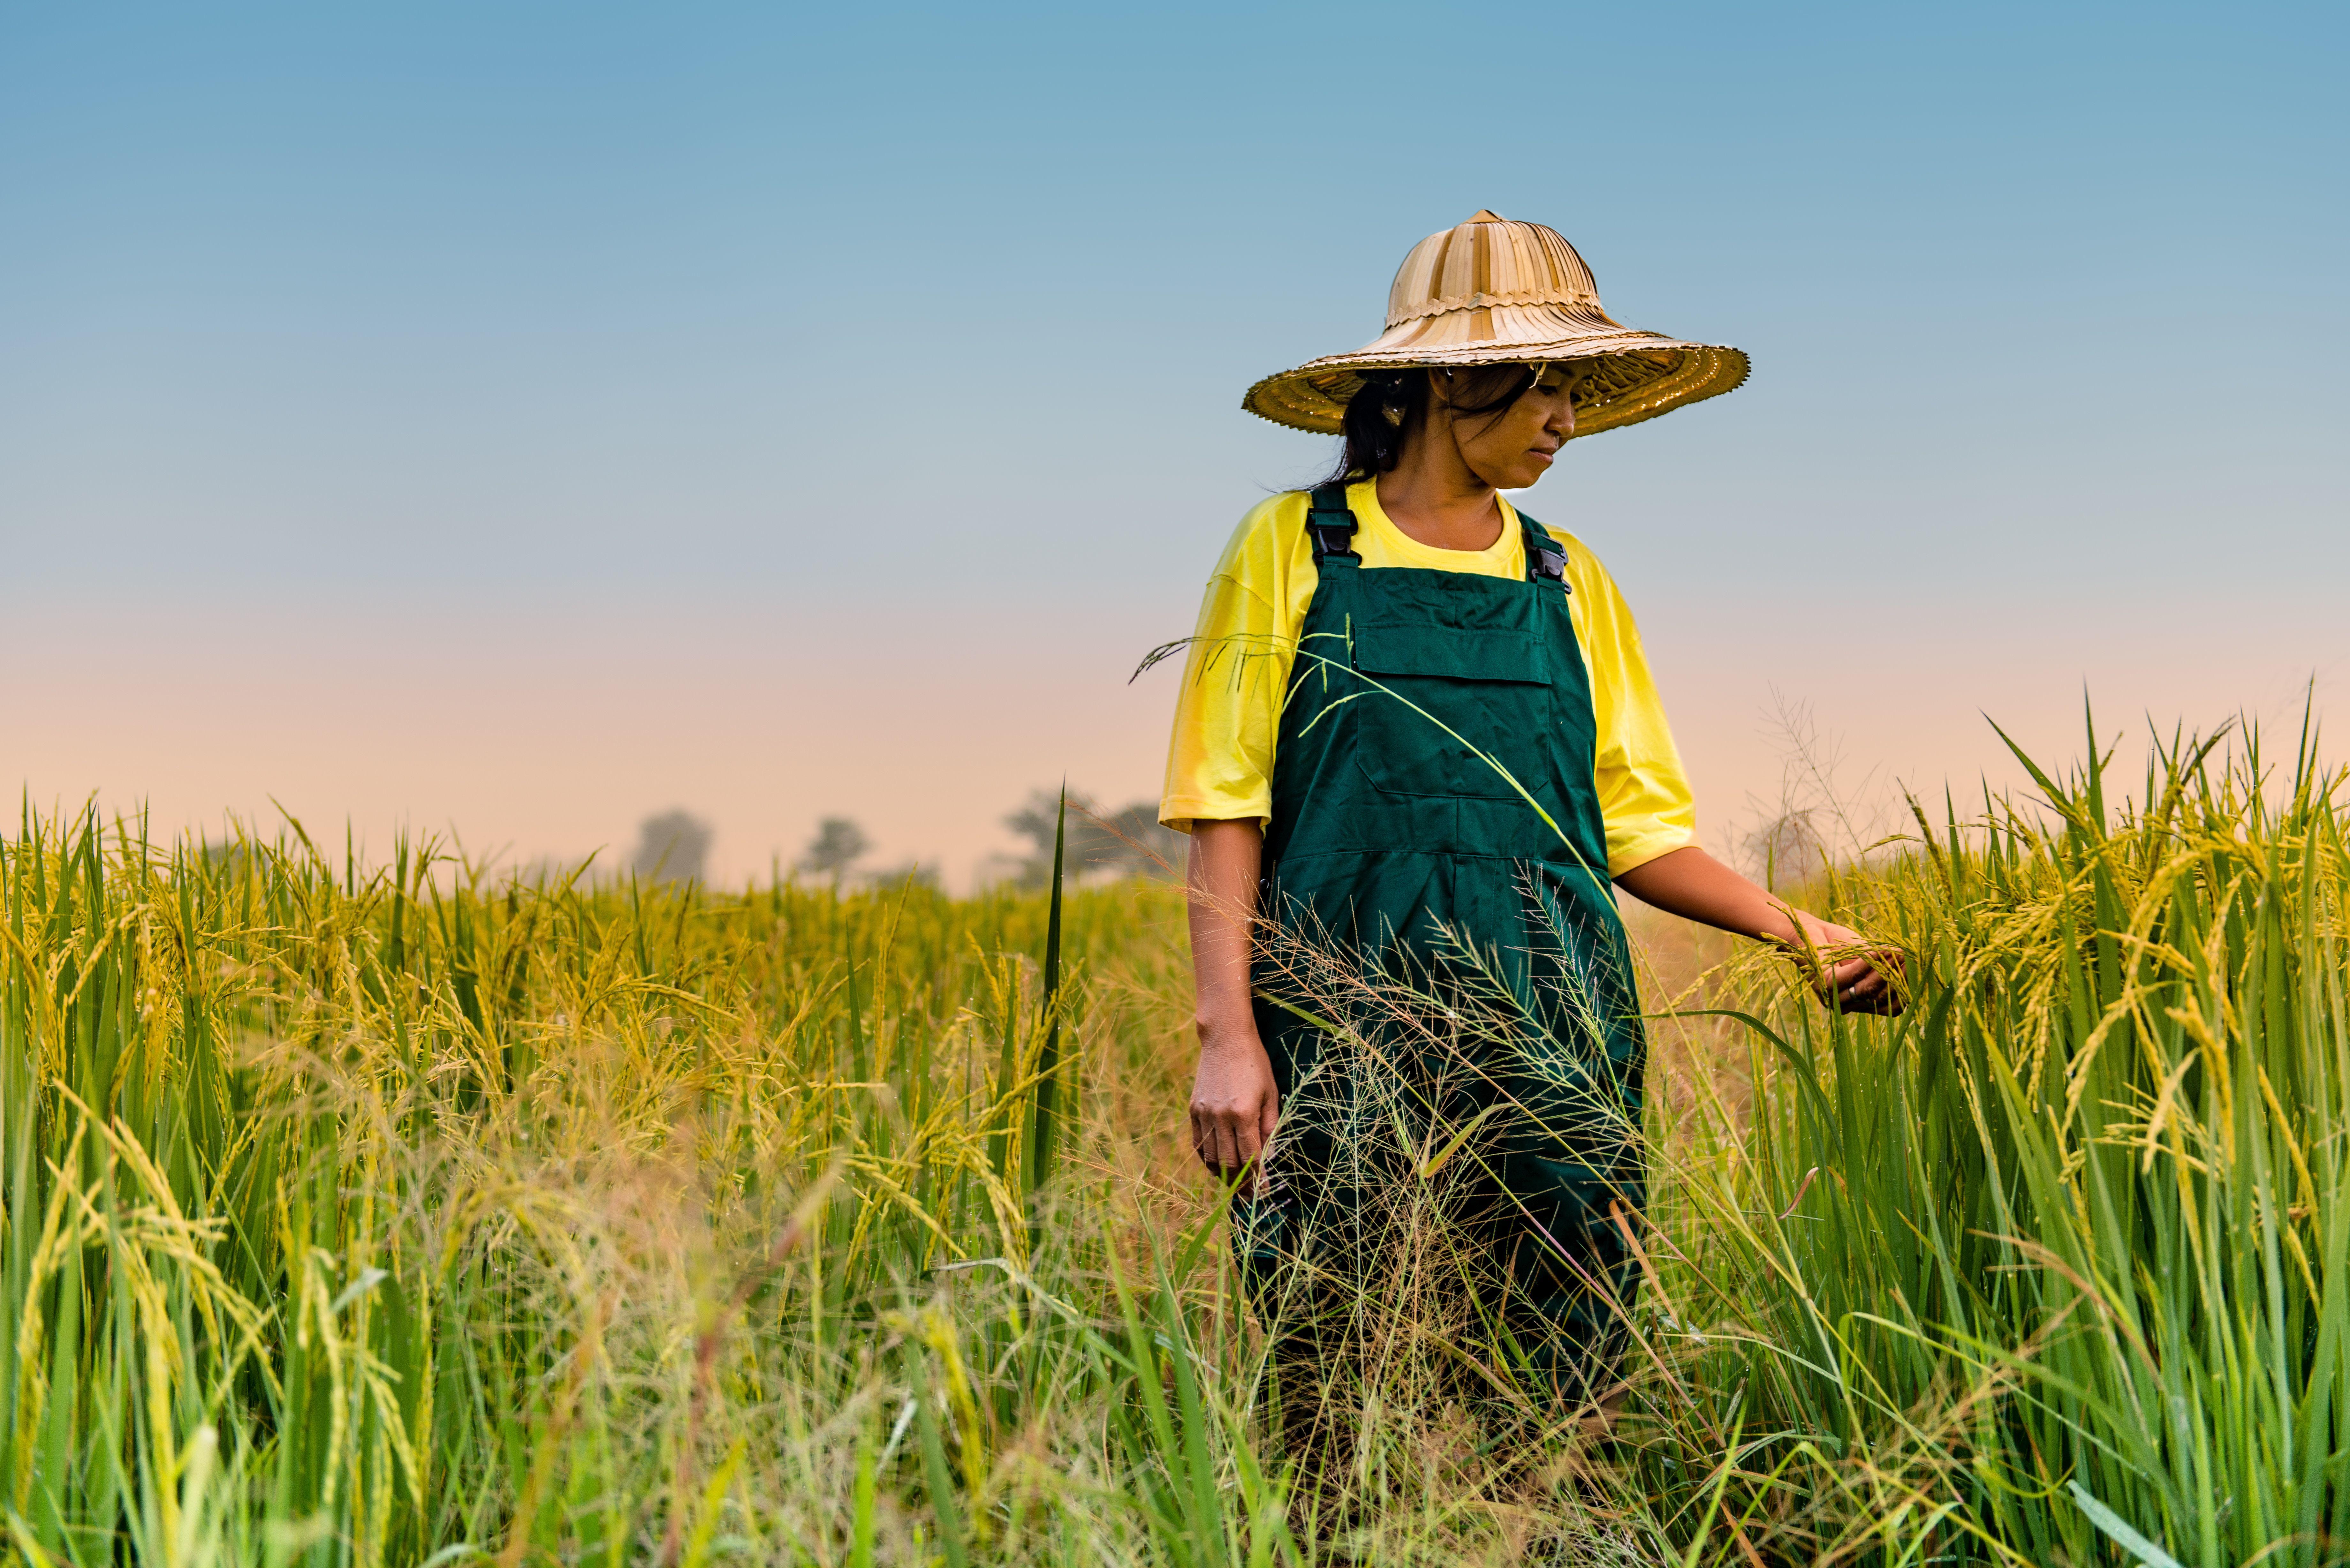 a photo of a south east Asian woman, walking through a crop